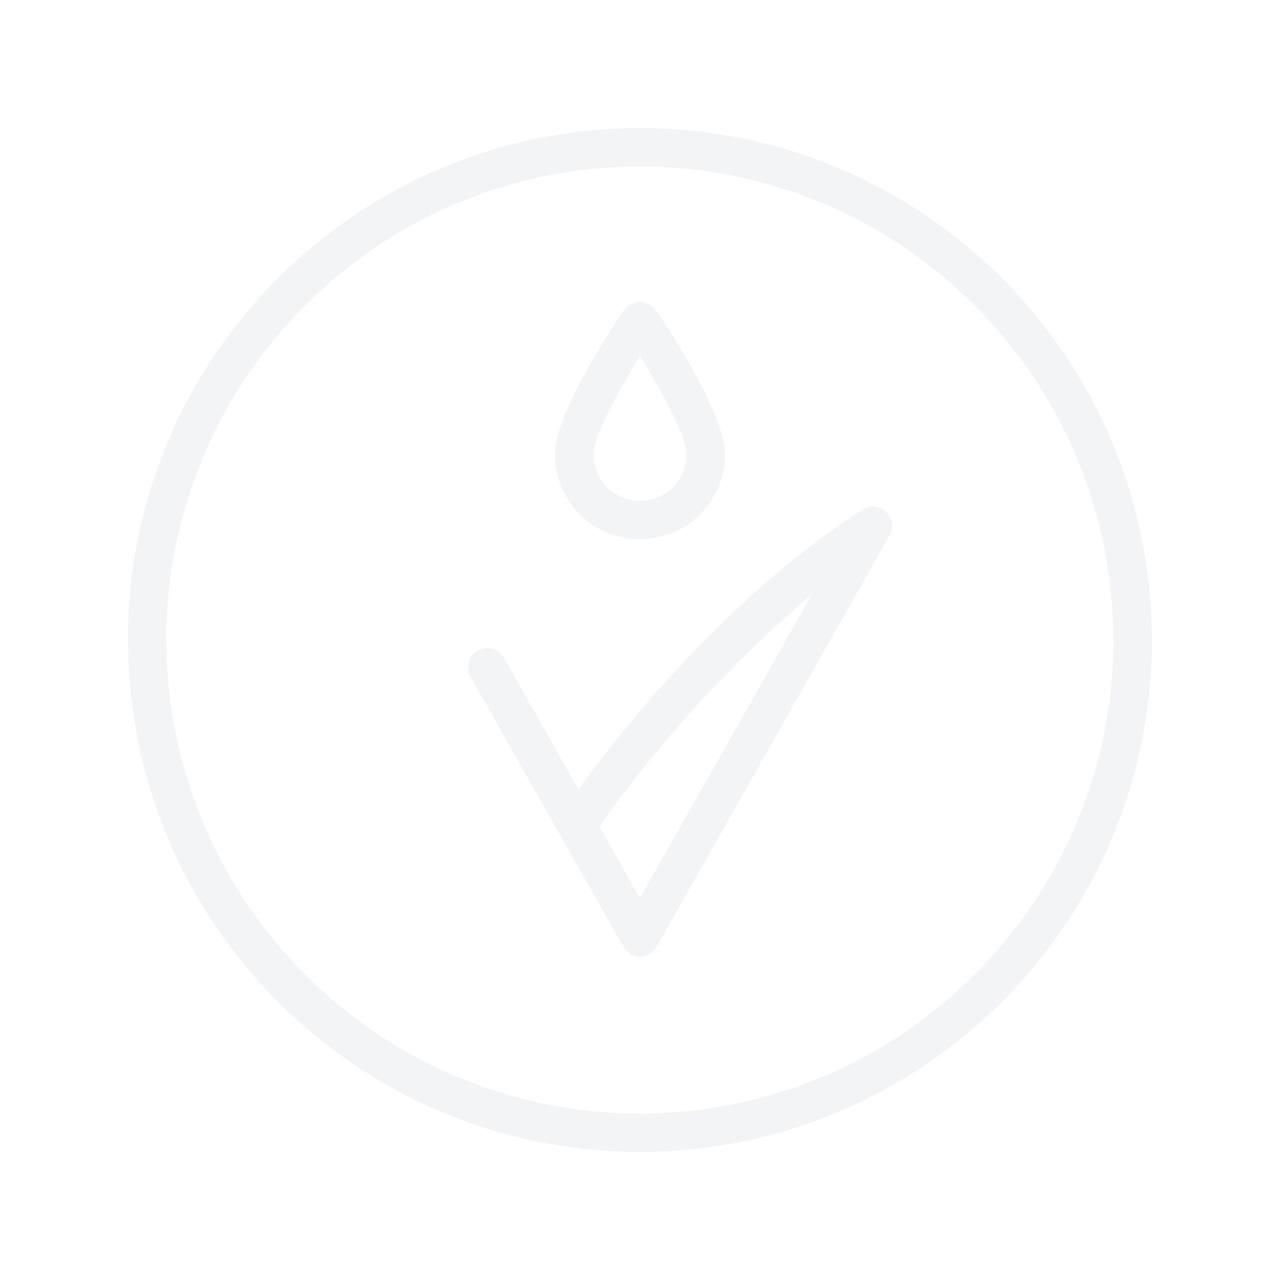 LUUV Natural Self Tanning Oil натуральный автозагар 100ml